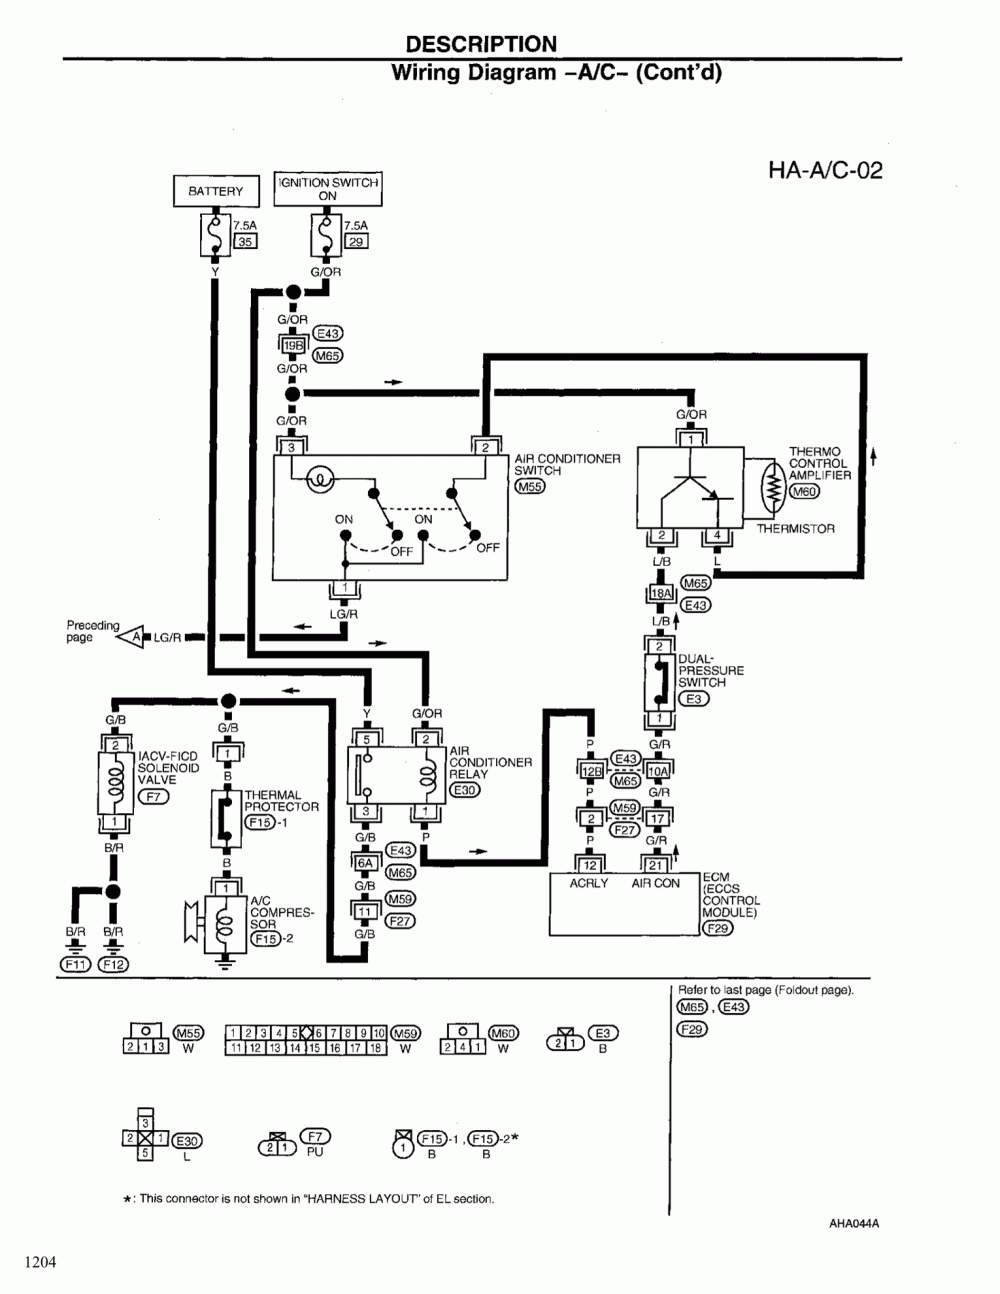 medium resolution of 2000 nissan frontier wiring diagram collection 2006 nissan frontier engine diagram 2004 nissan frontier wiring